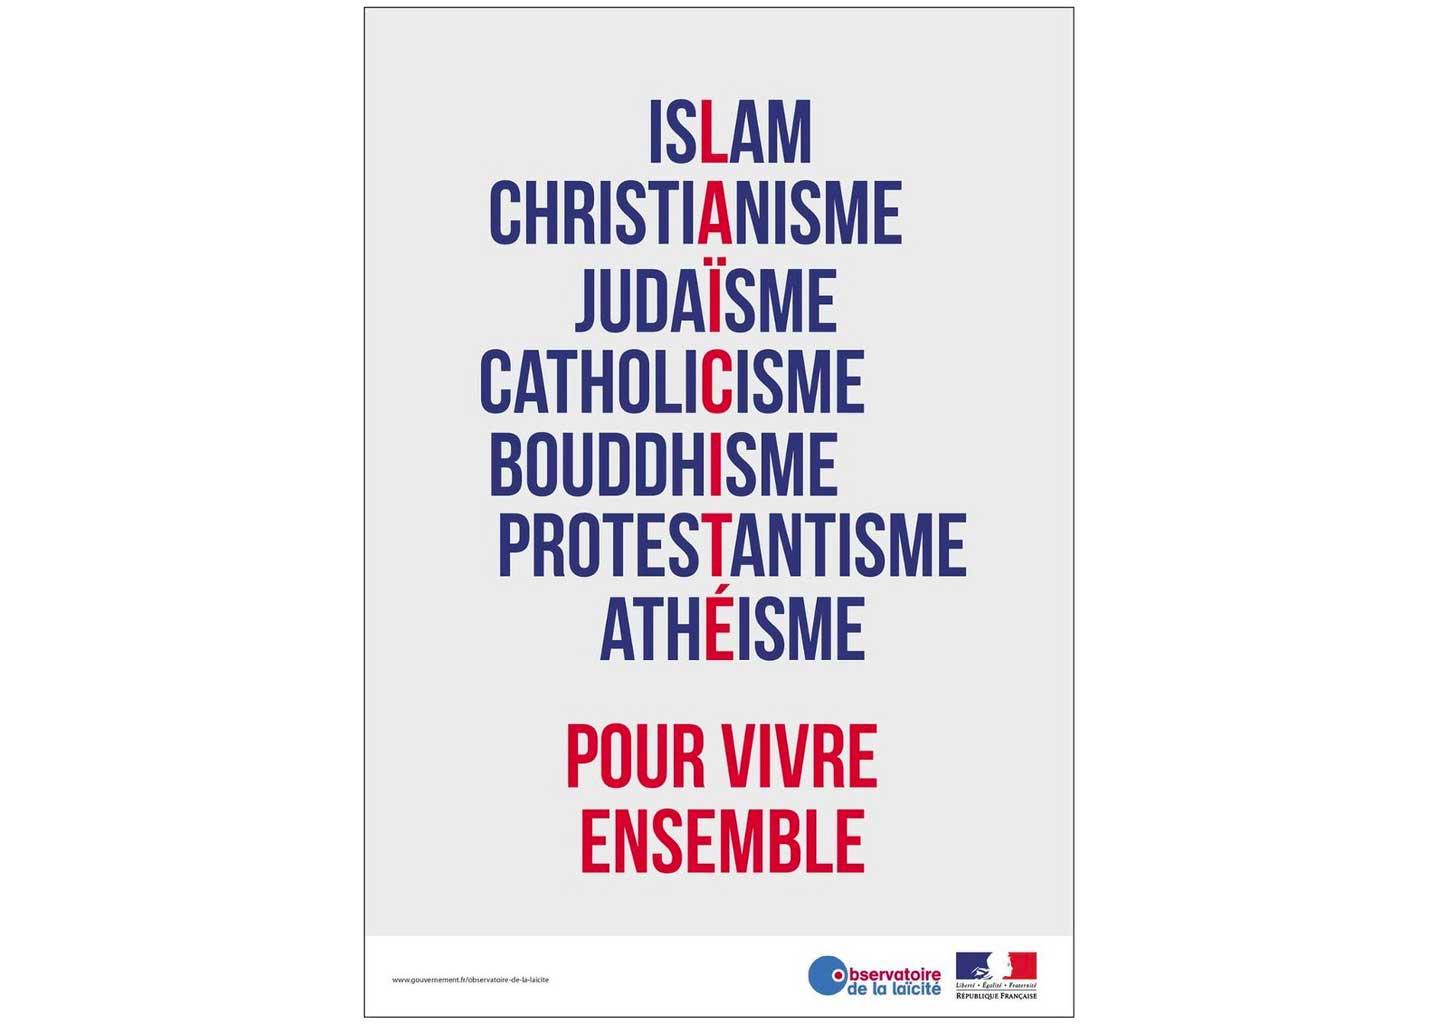 Islam, Christianisme, Judaïsme, Catholicisme, Bouddhisme, Protestantisme, Athéisme Pour Vivre Ensemble